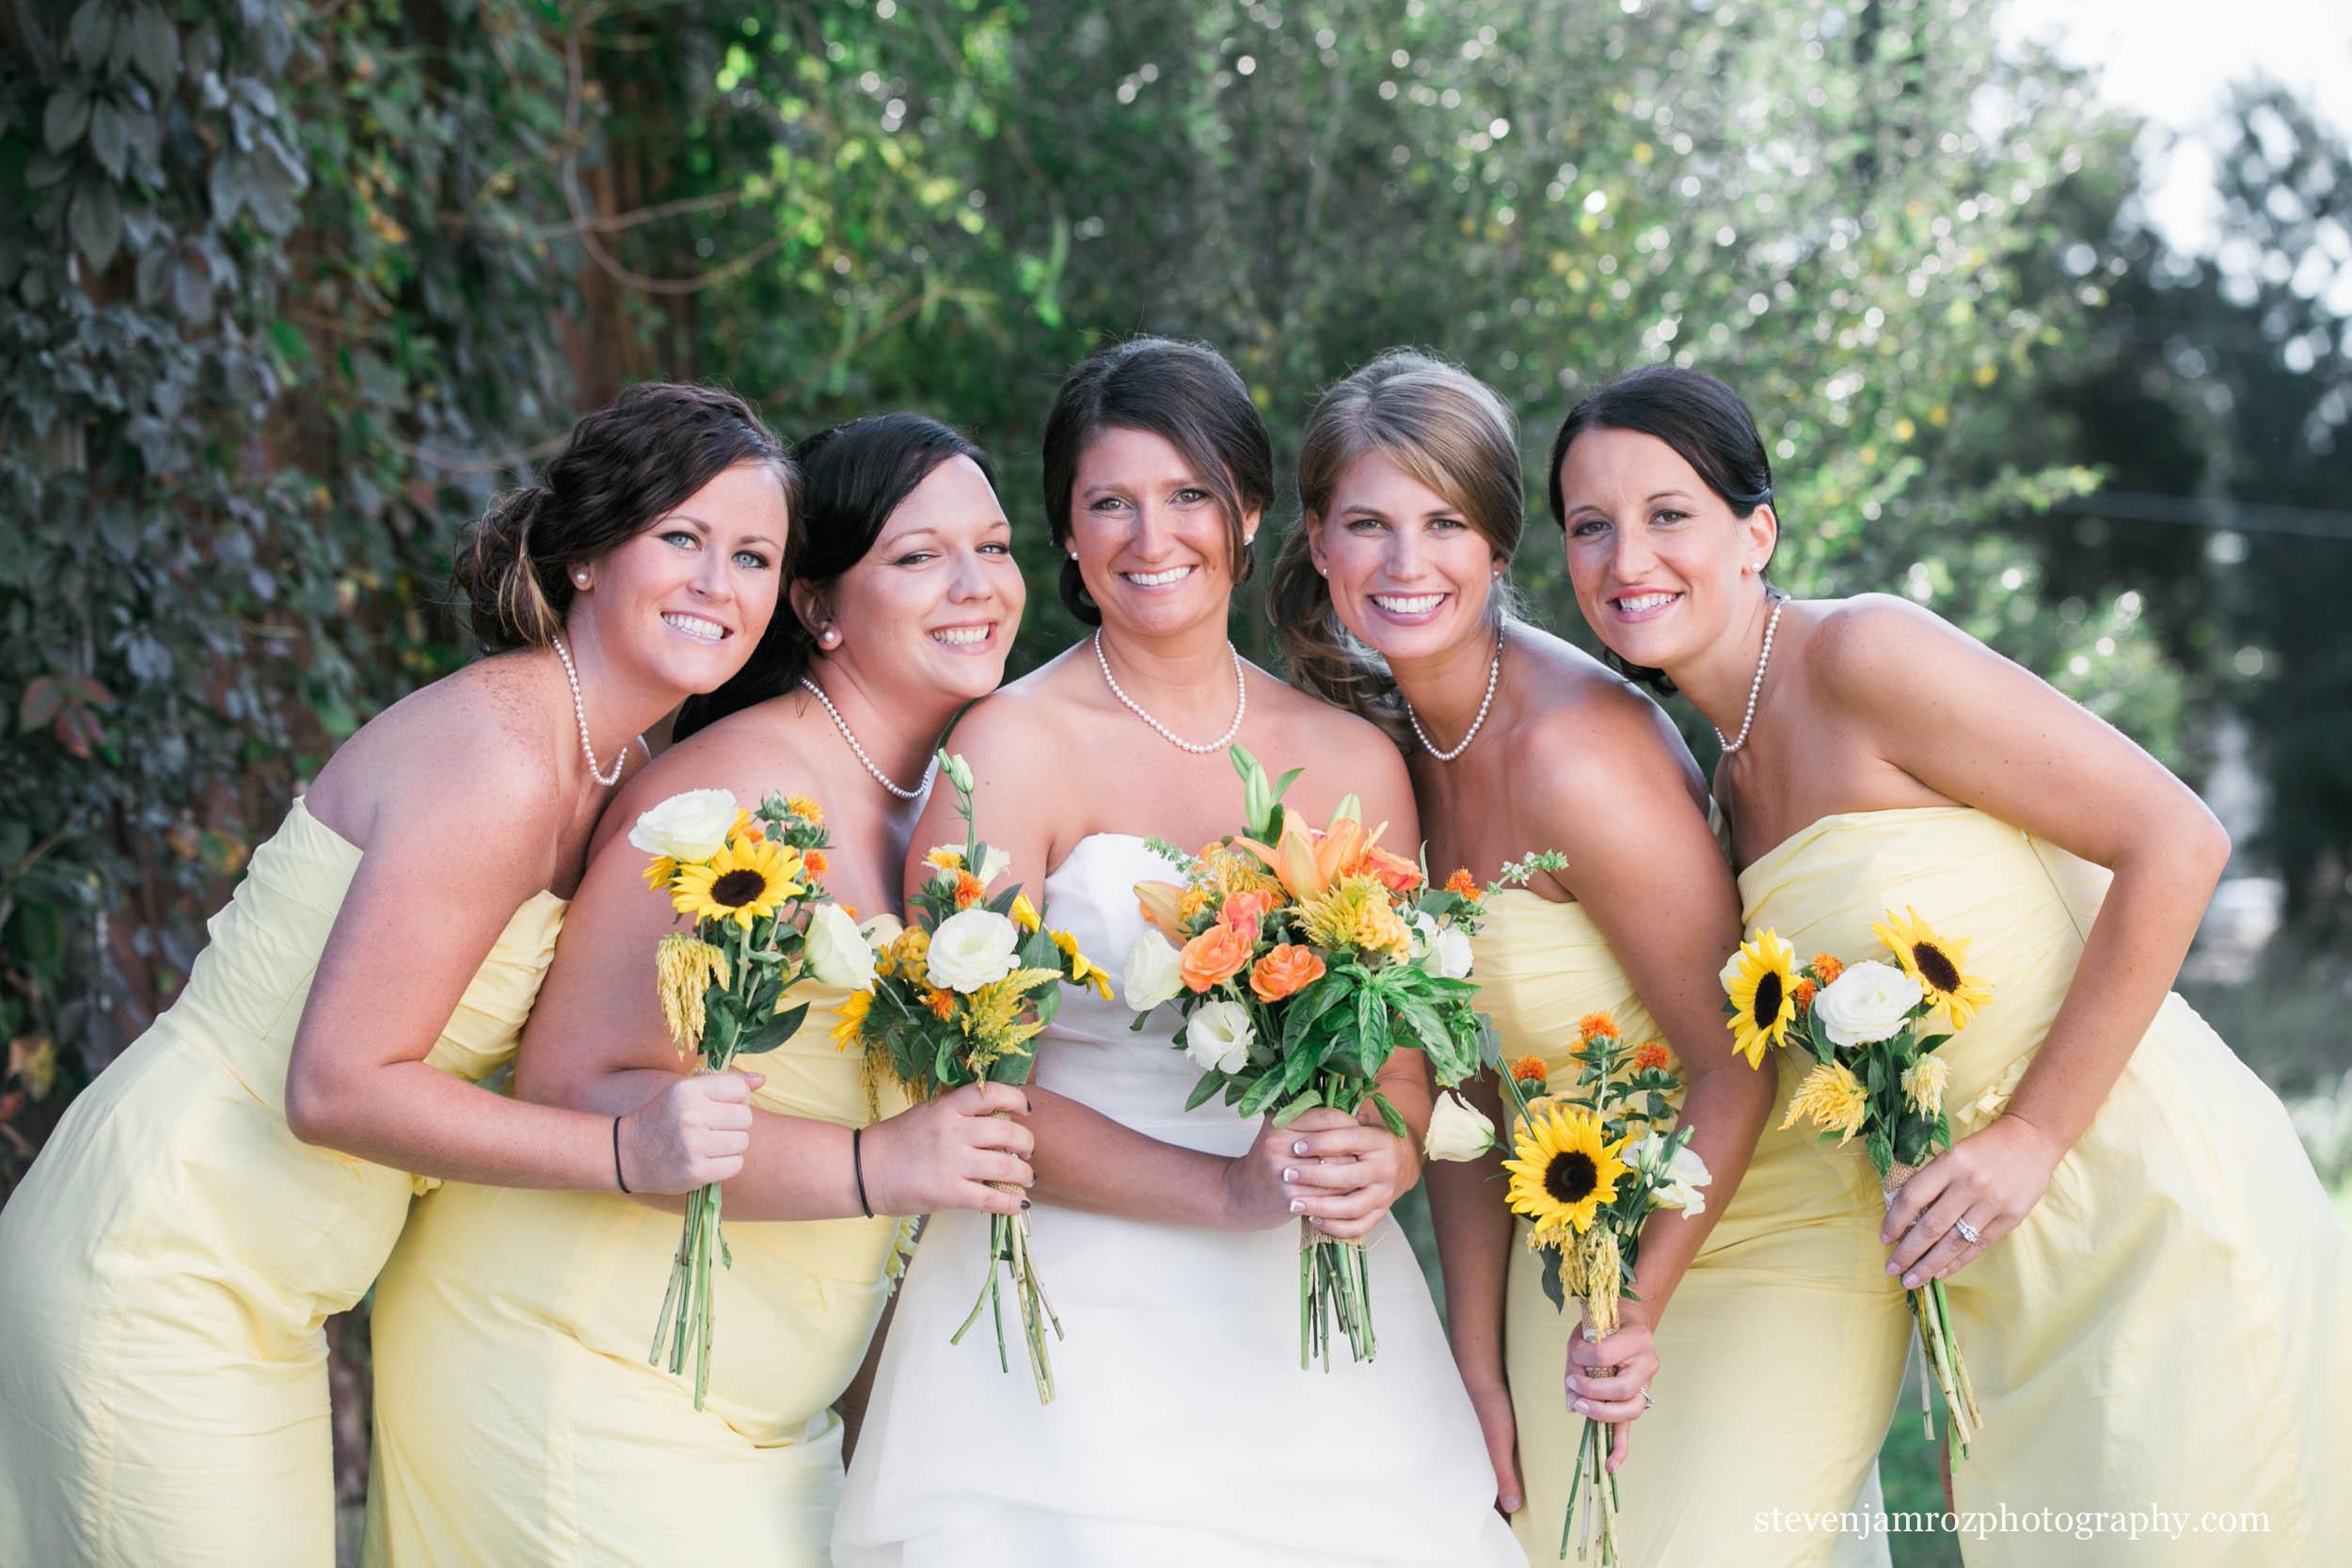 yellow-bridesmaid-dresses-steven-jamroz-photography-0167.jpg